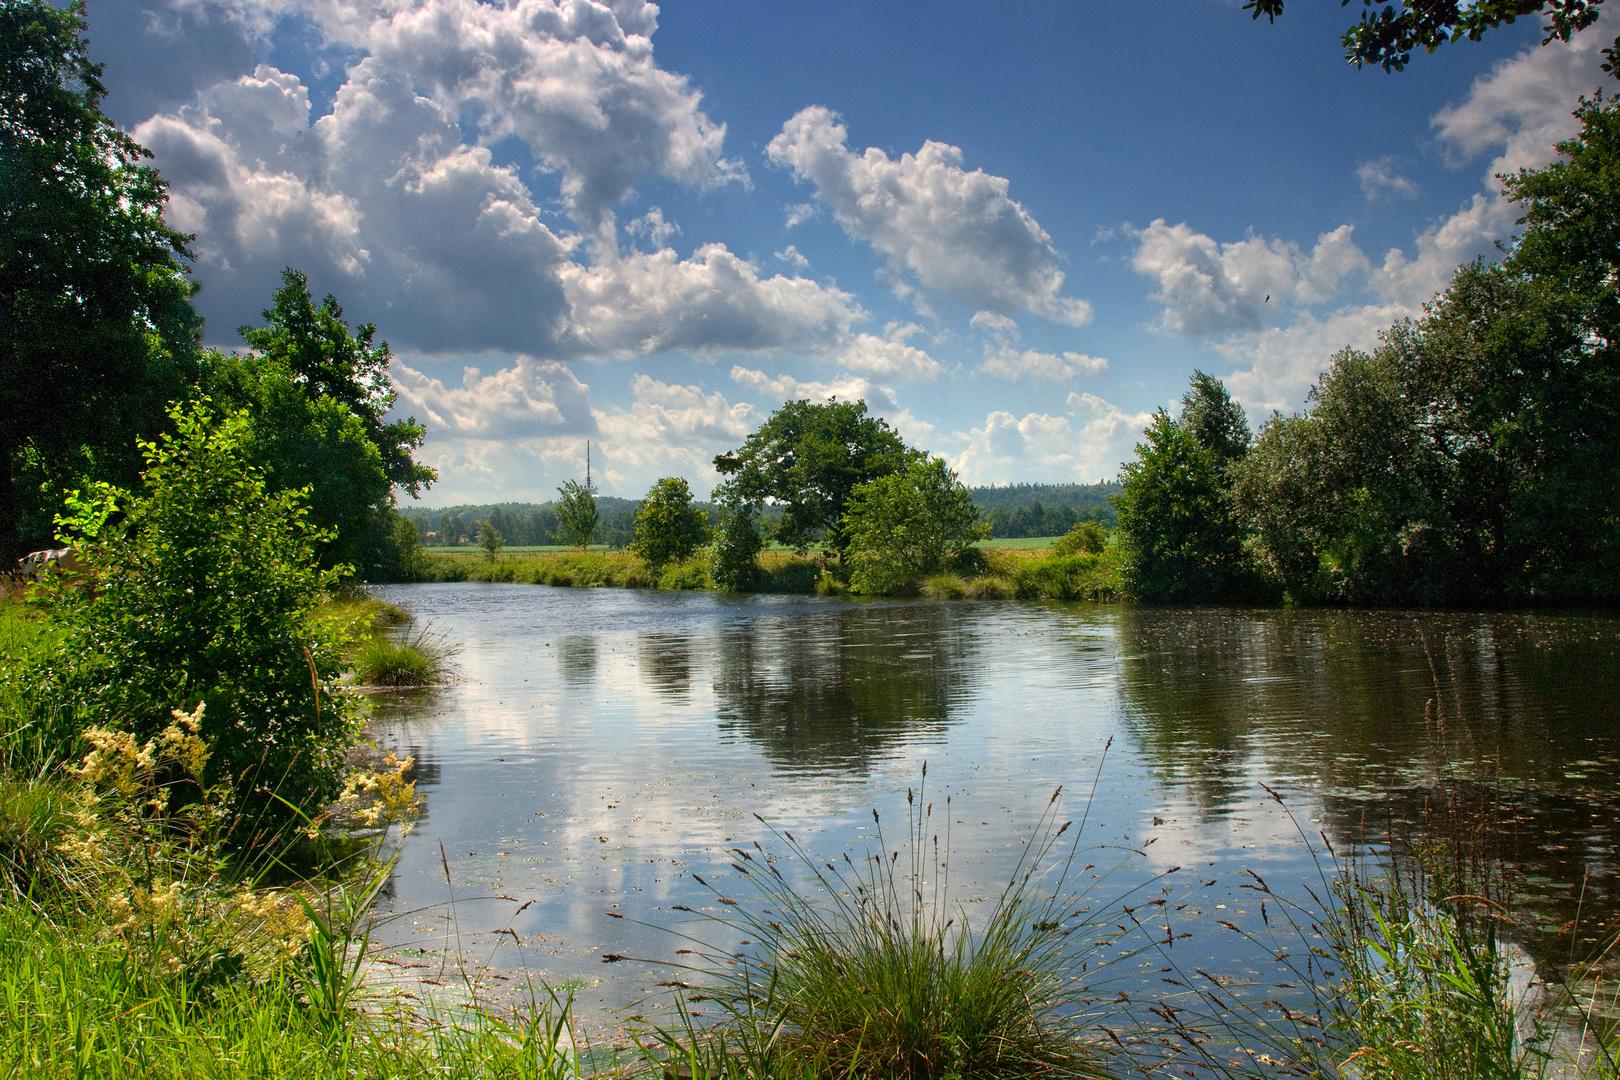 Sommer am Teich